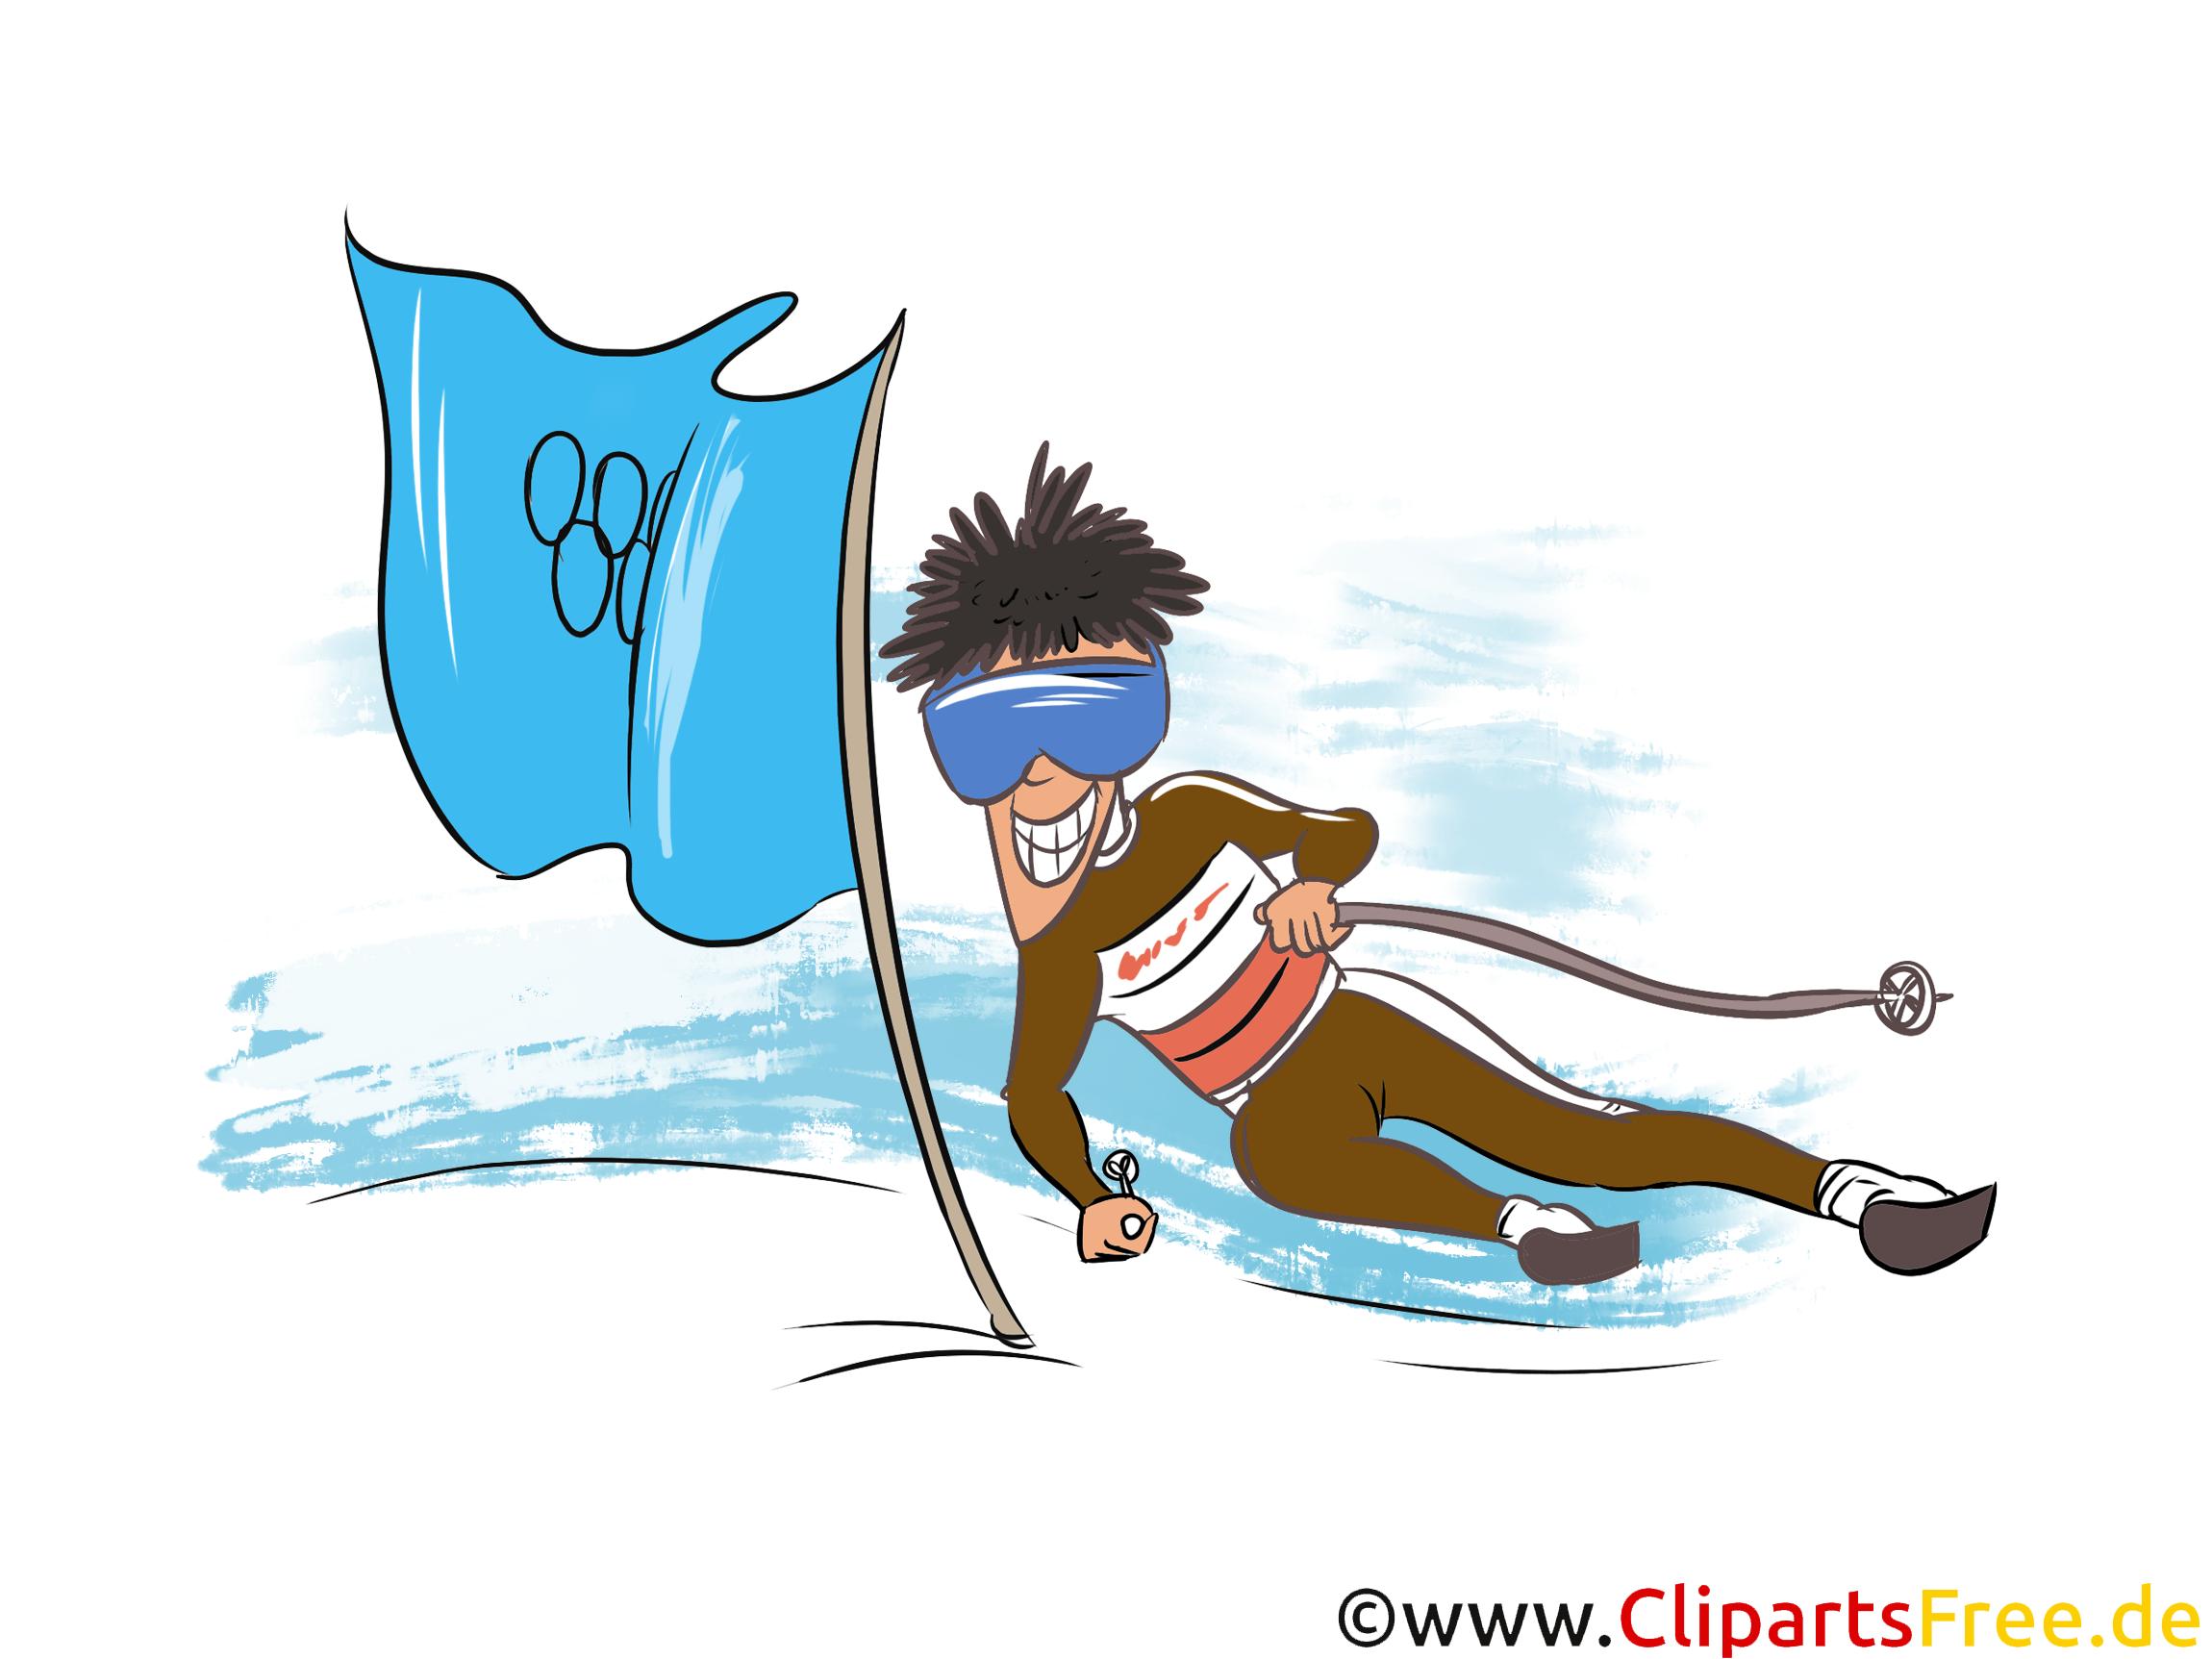 wintersport ski alpin cliparts bilder grafiken. Black Bedroom Furniture Sets. Home Design Ideas